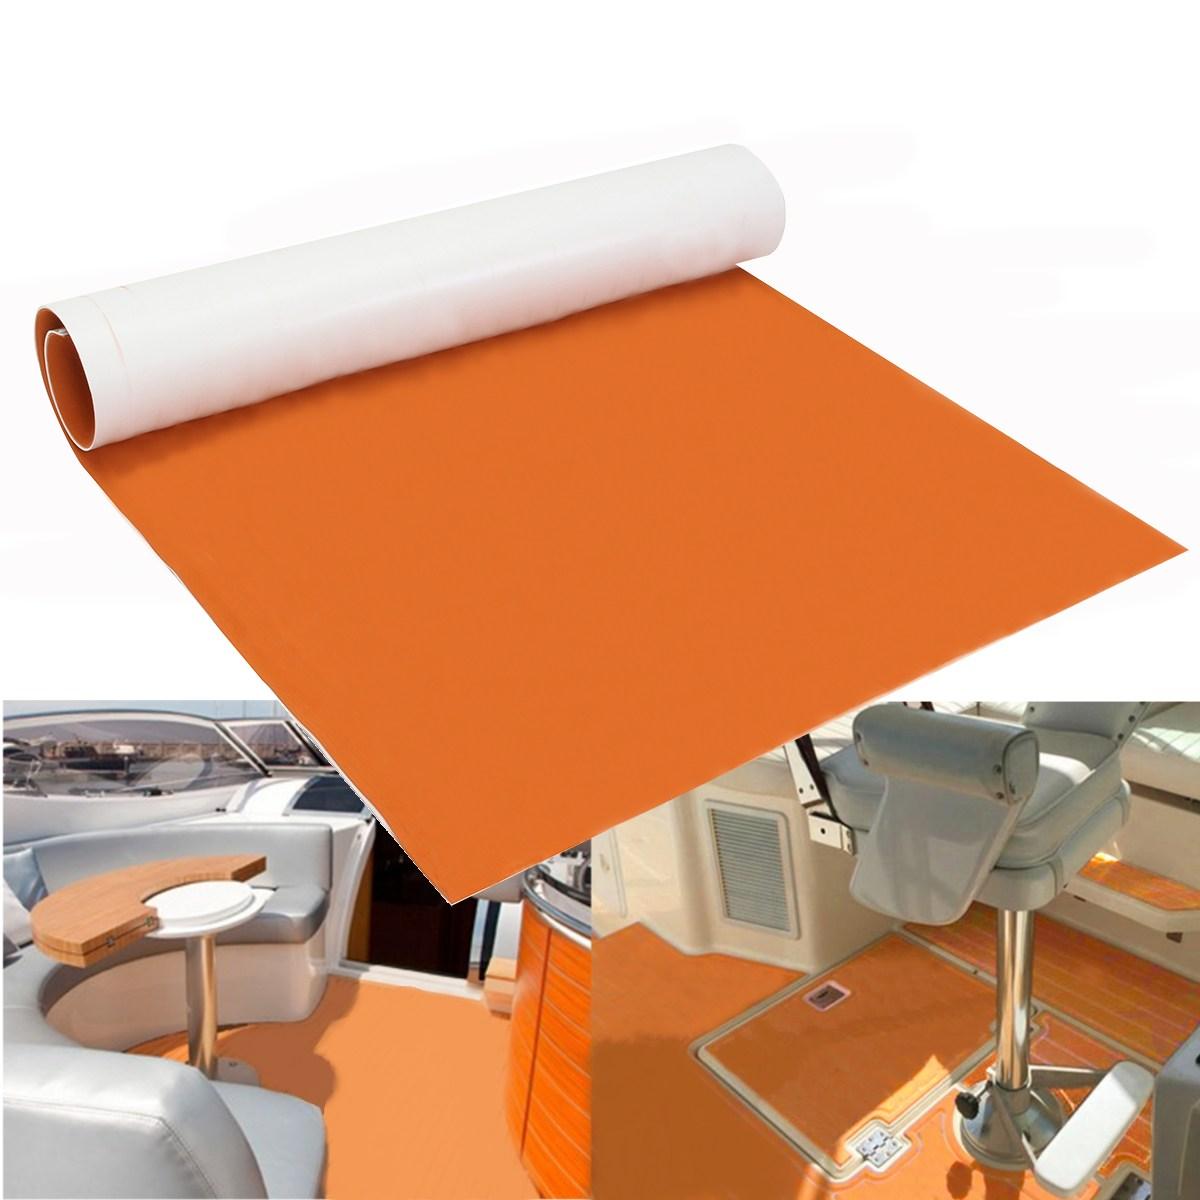 120CM x 200CM Self-Adhesive Marine <font><b>Flooring</b></font> Teak EVA RV Touring Car Mat Interior Accessories Foam Boat Yacht Decking Sheet